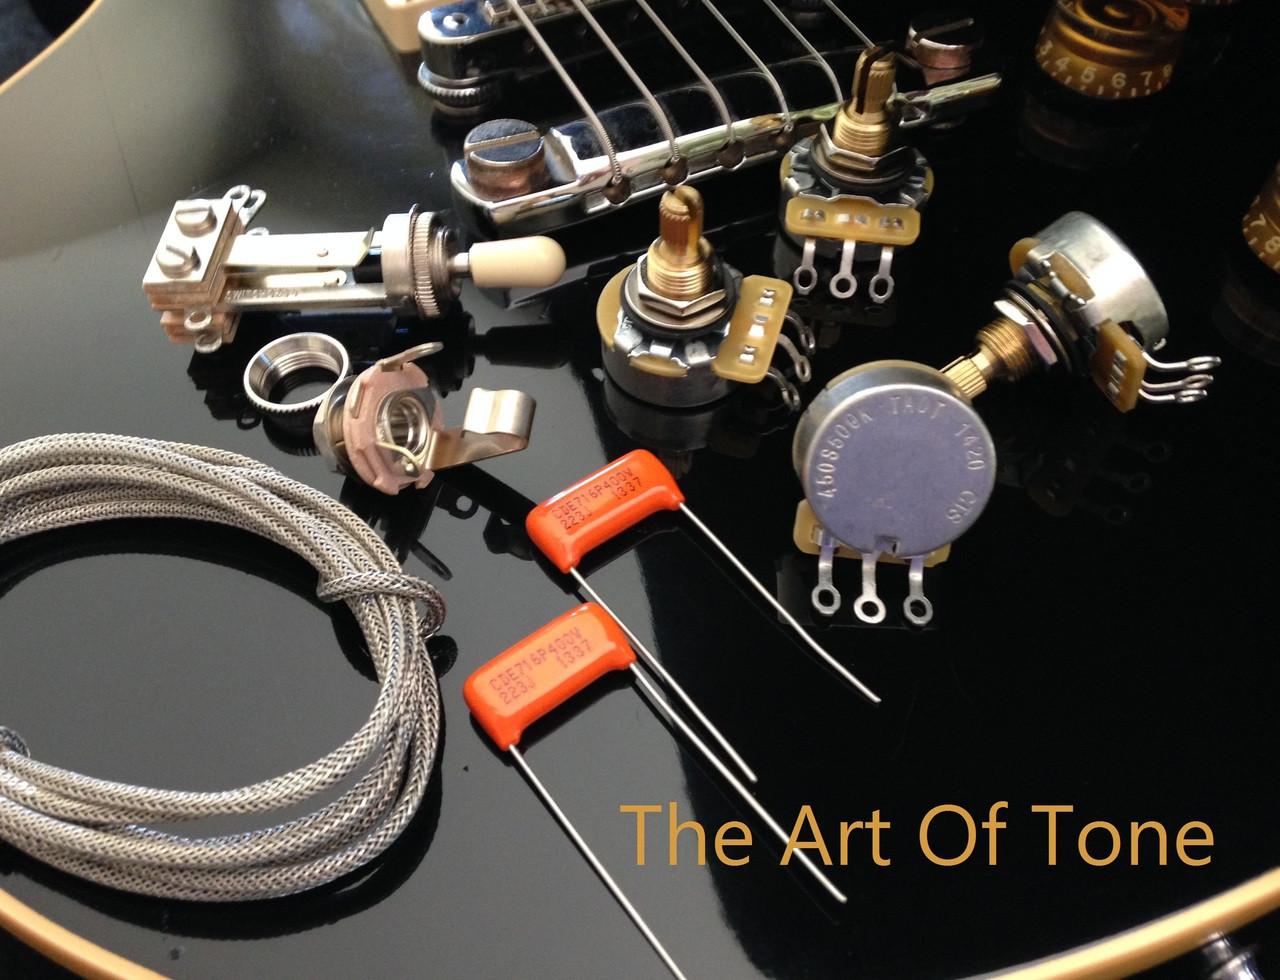 deluxe short shaft wiring kit for gibson usa les paul guitars rh theartoftone com gibson les paul wiring kits gibson wiring set